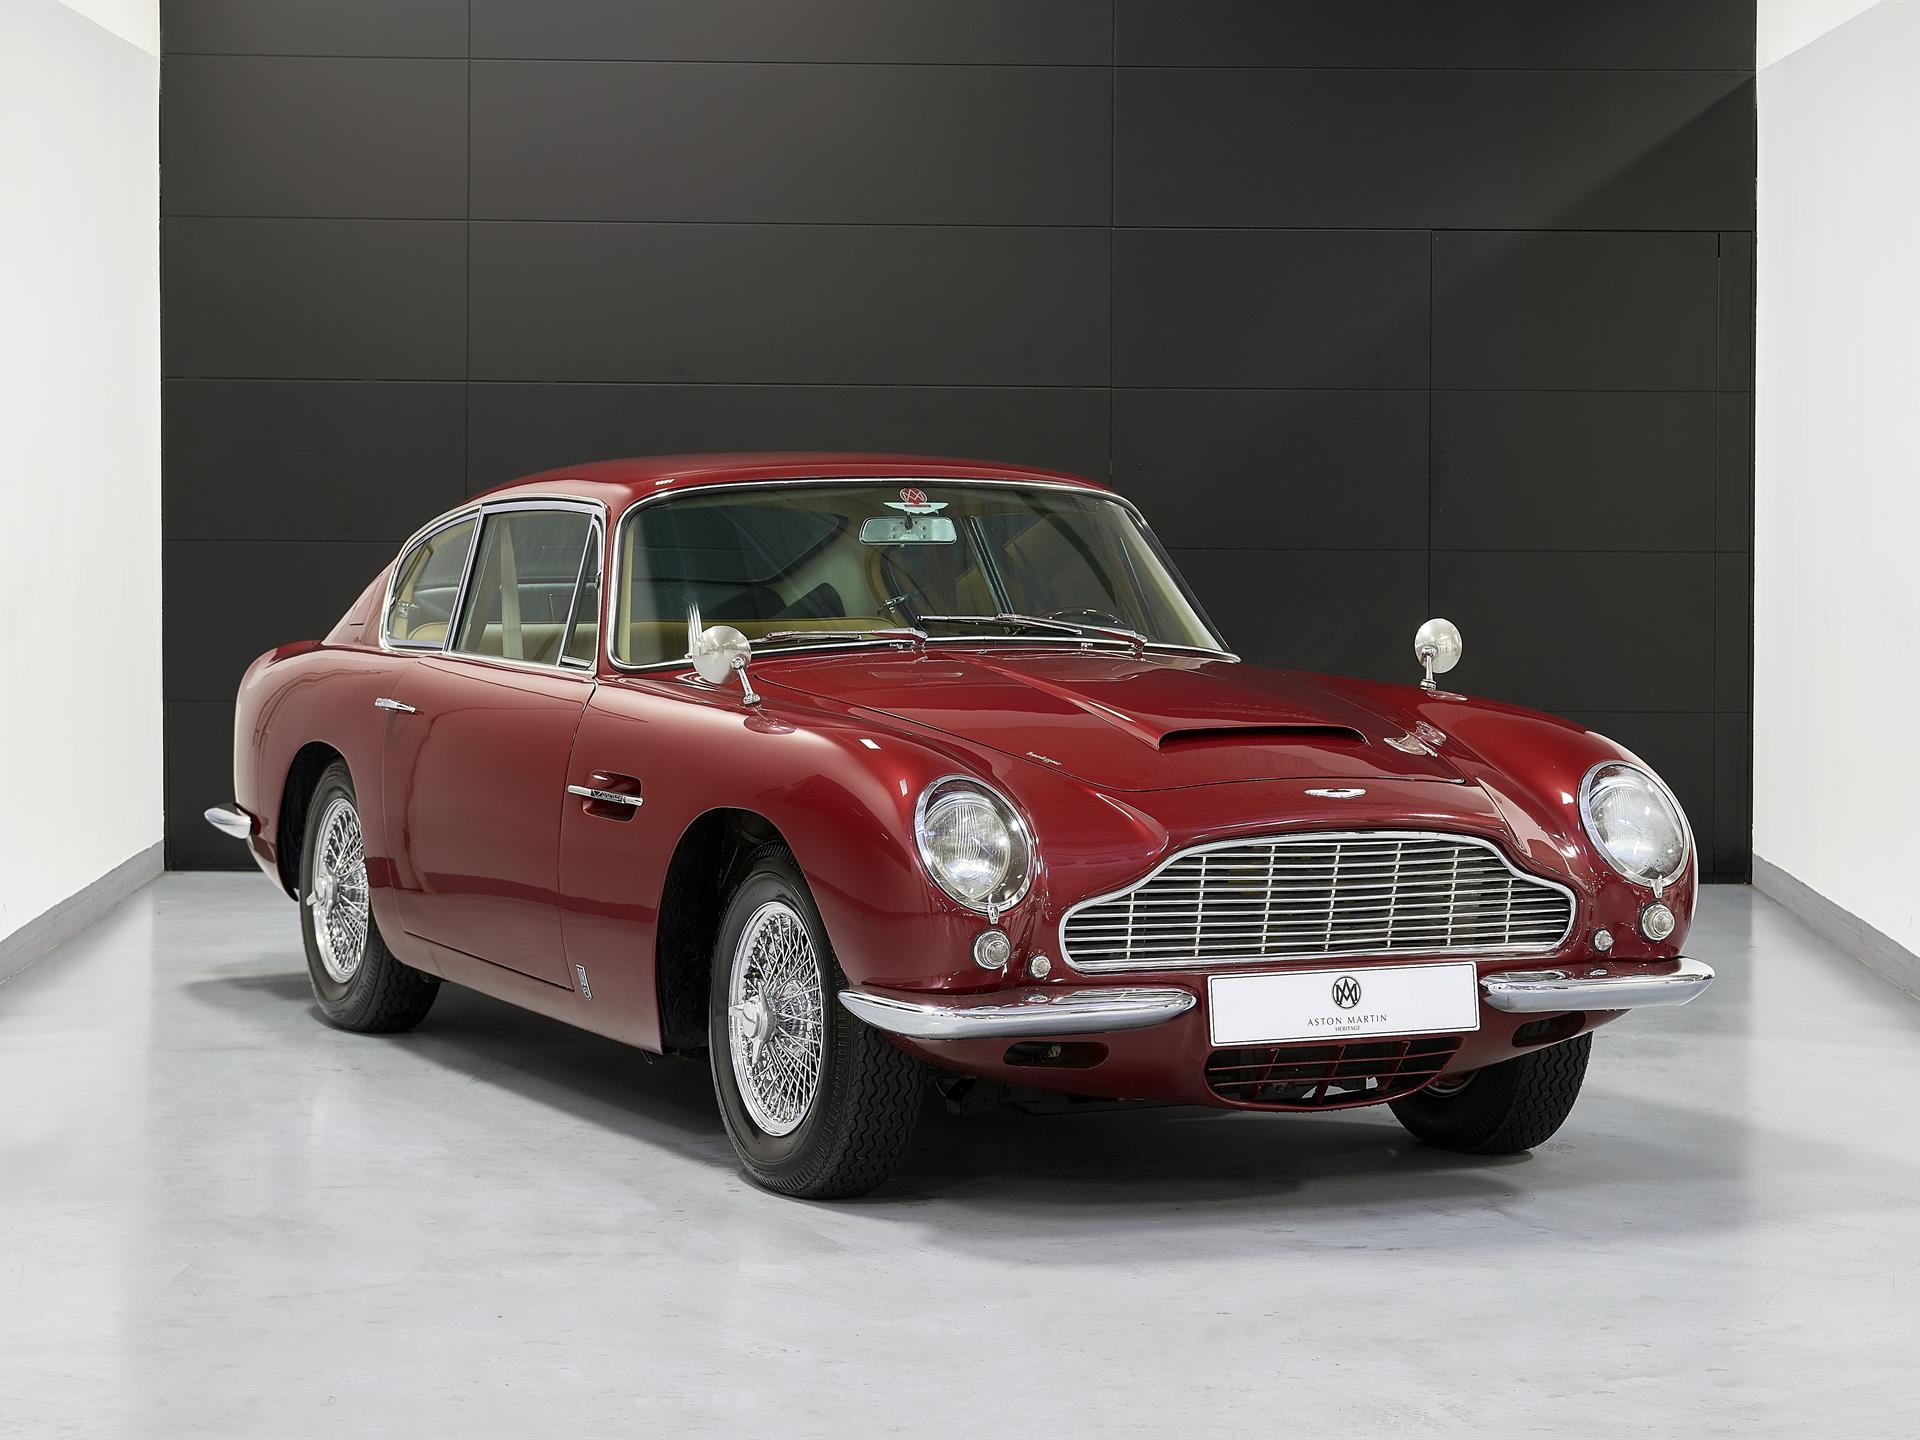 Aston Martin Db6 Saloon Deep Red Db63425l Aston Martin Works